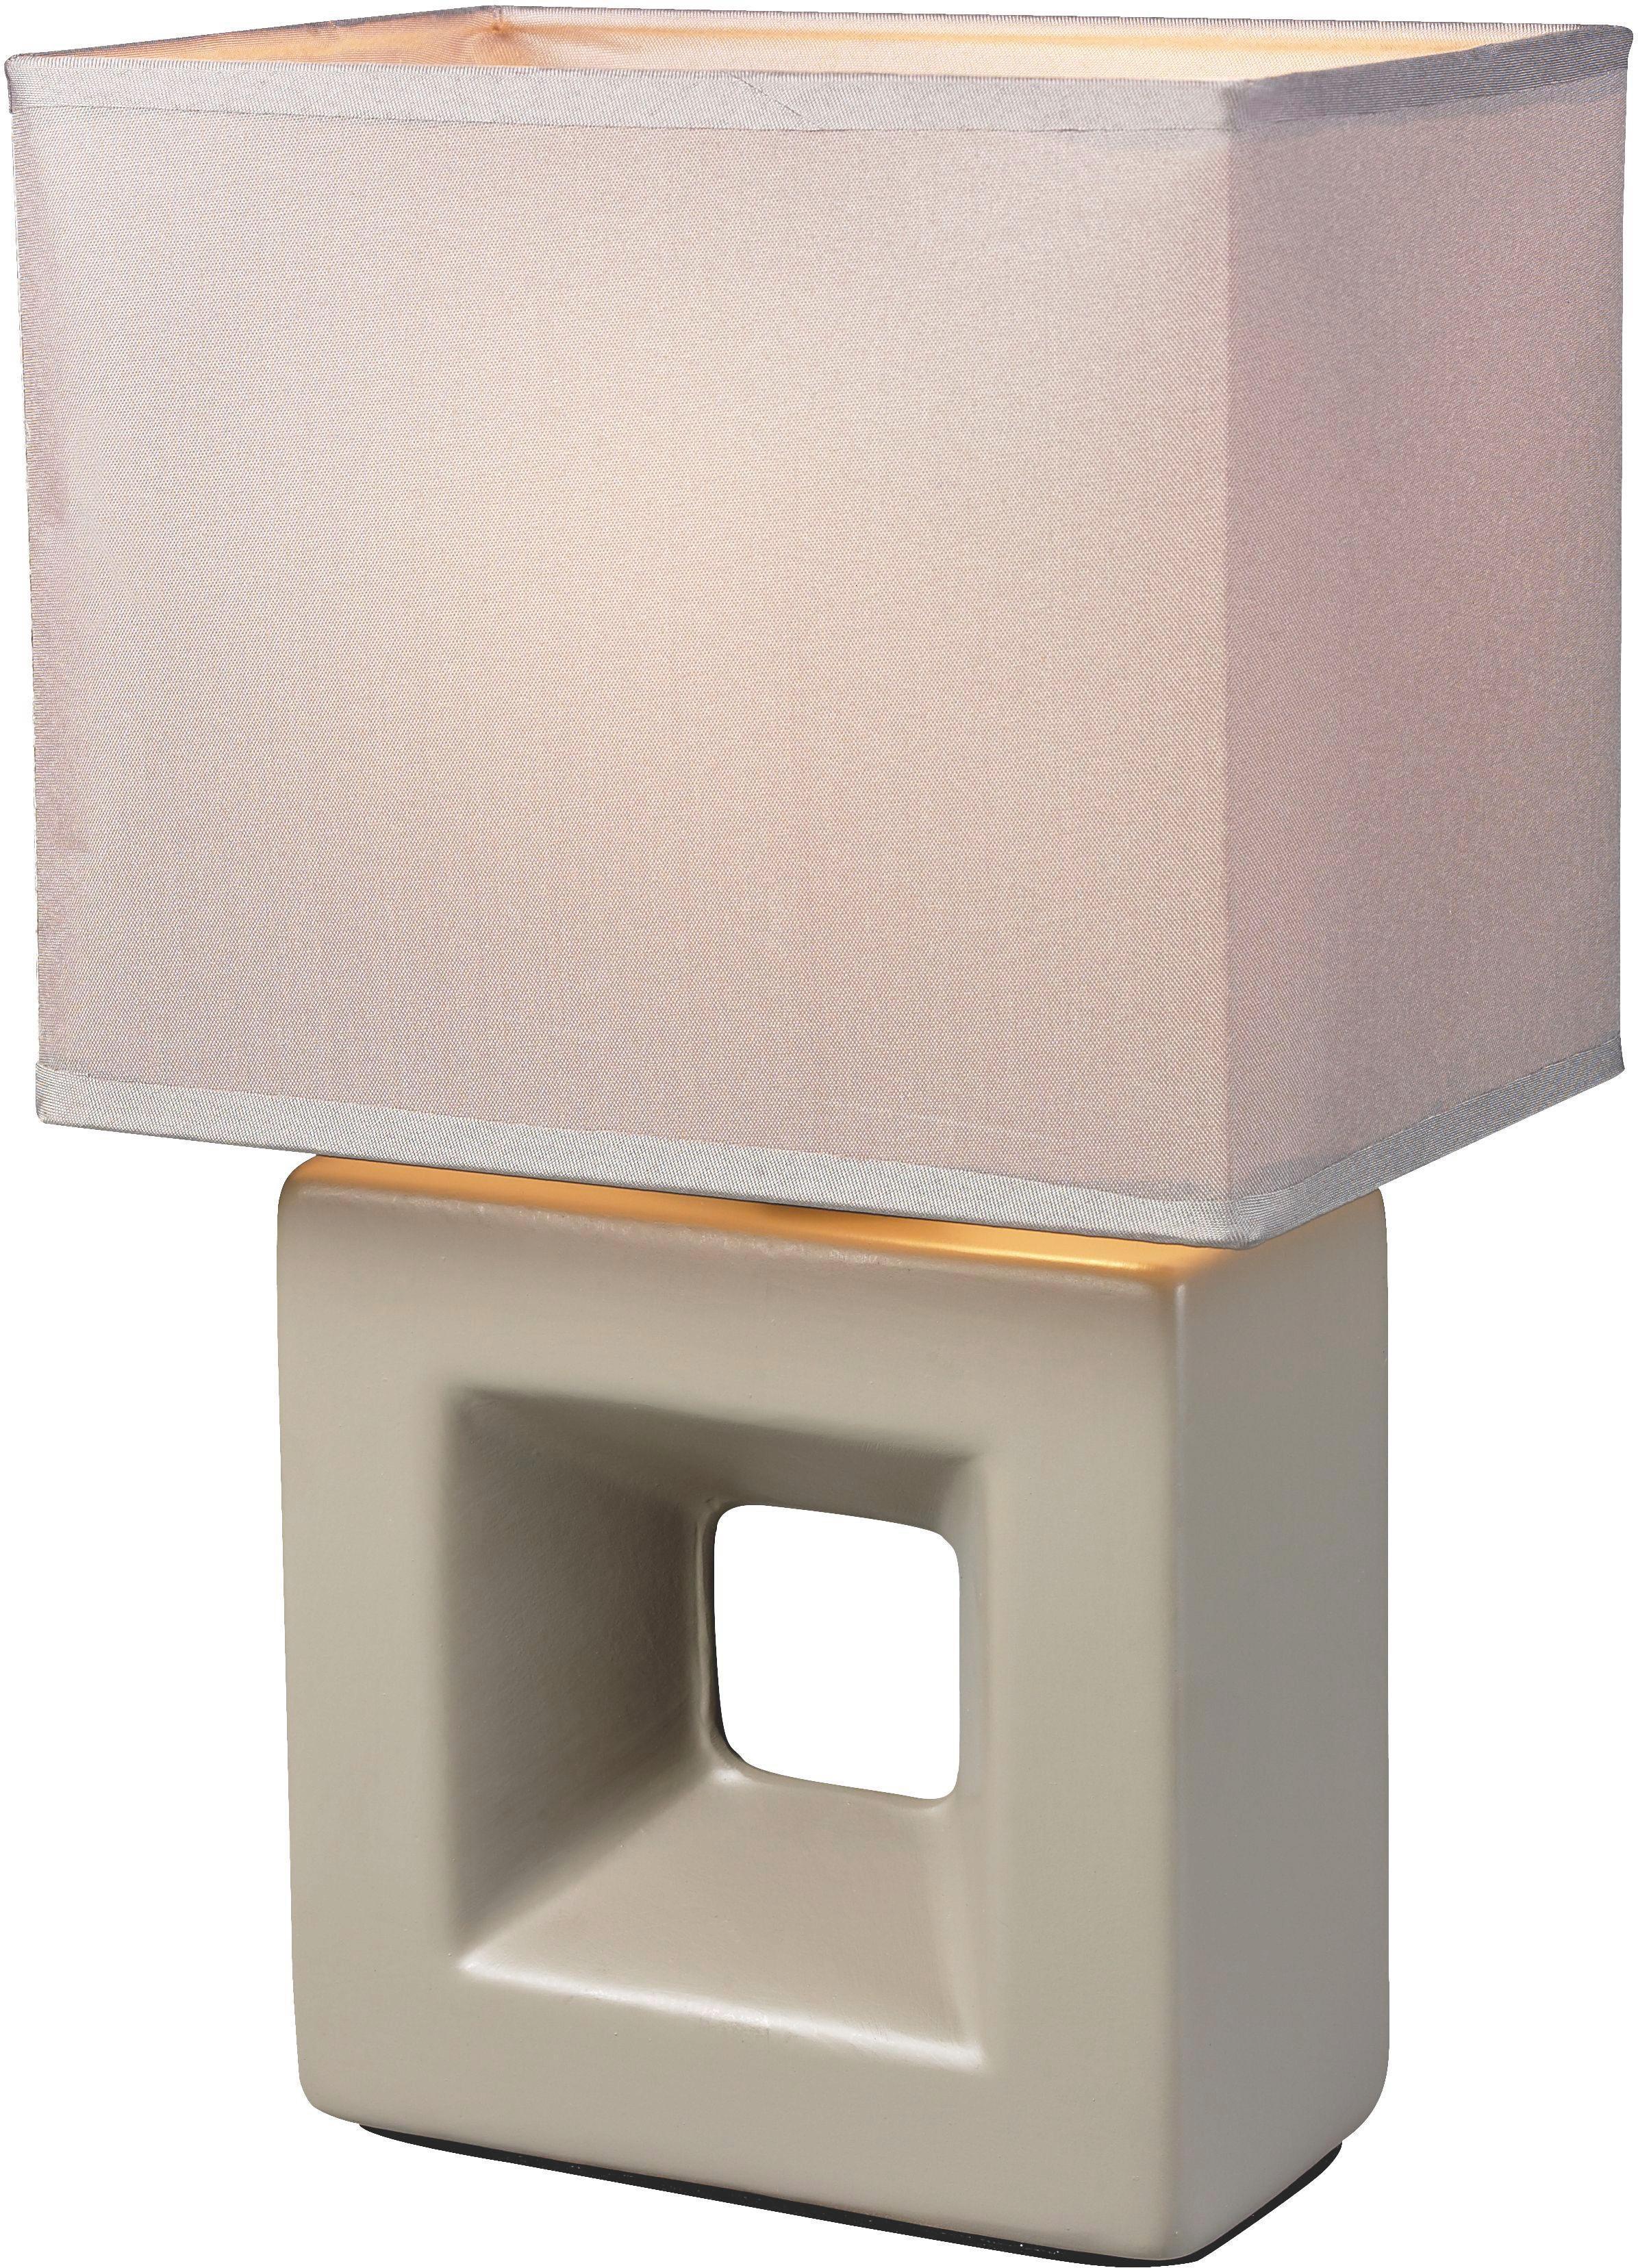 Lampa Stolní Quadro - šedohnědá, textil/keramika (17/12/28cm) - MÖMAX modern living